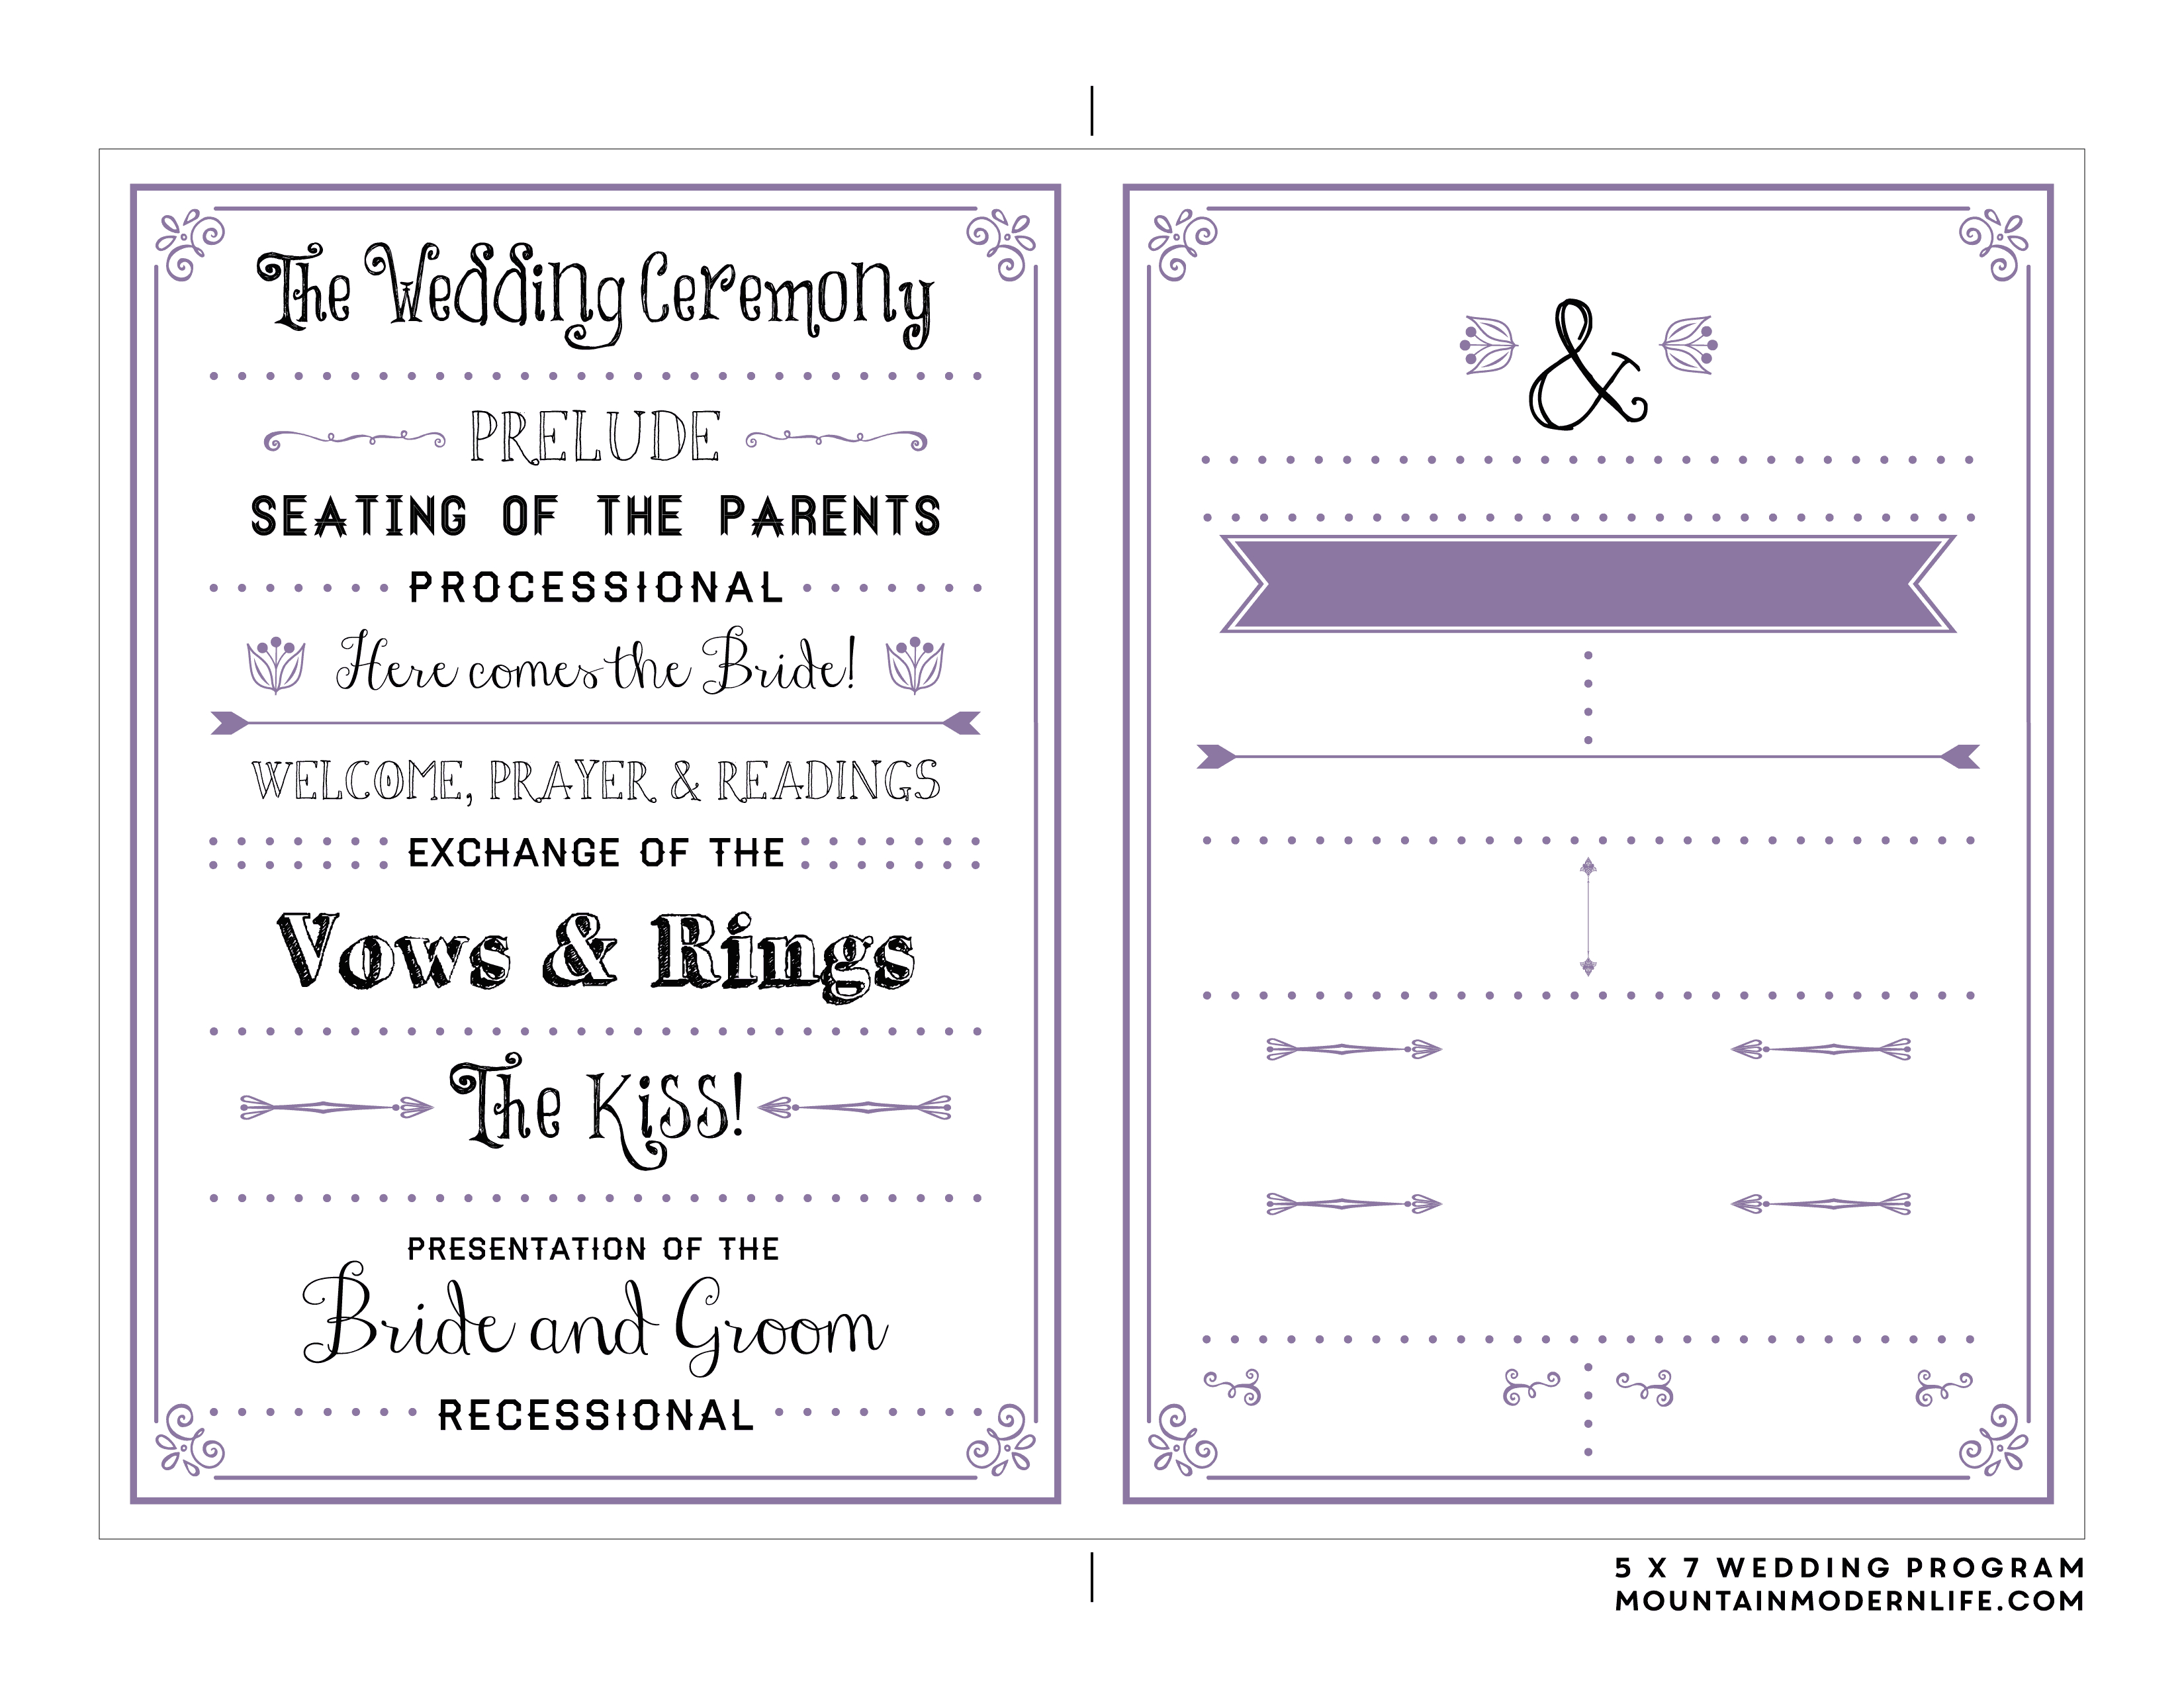 Free Printable Wedding Program   Mountainmodernlife - Free Printable Wedding Programs